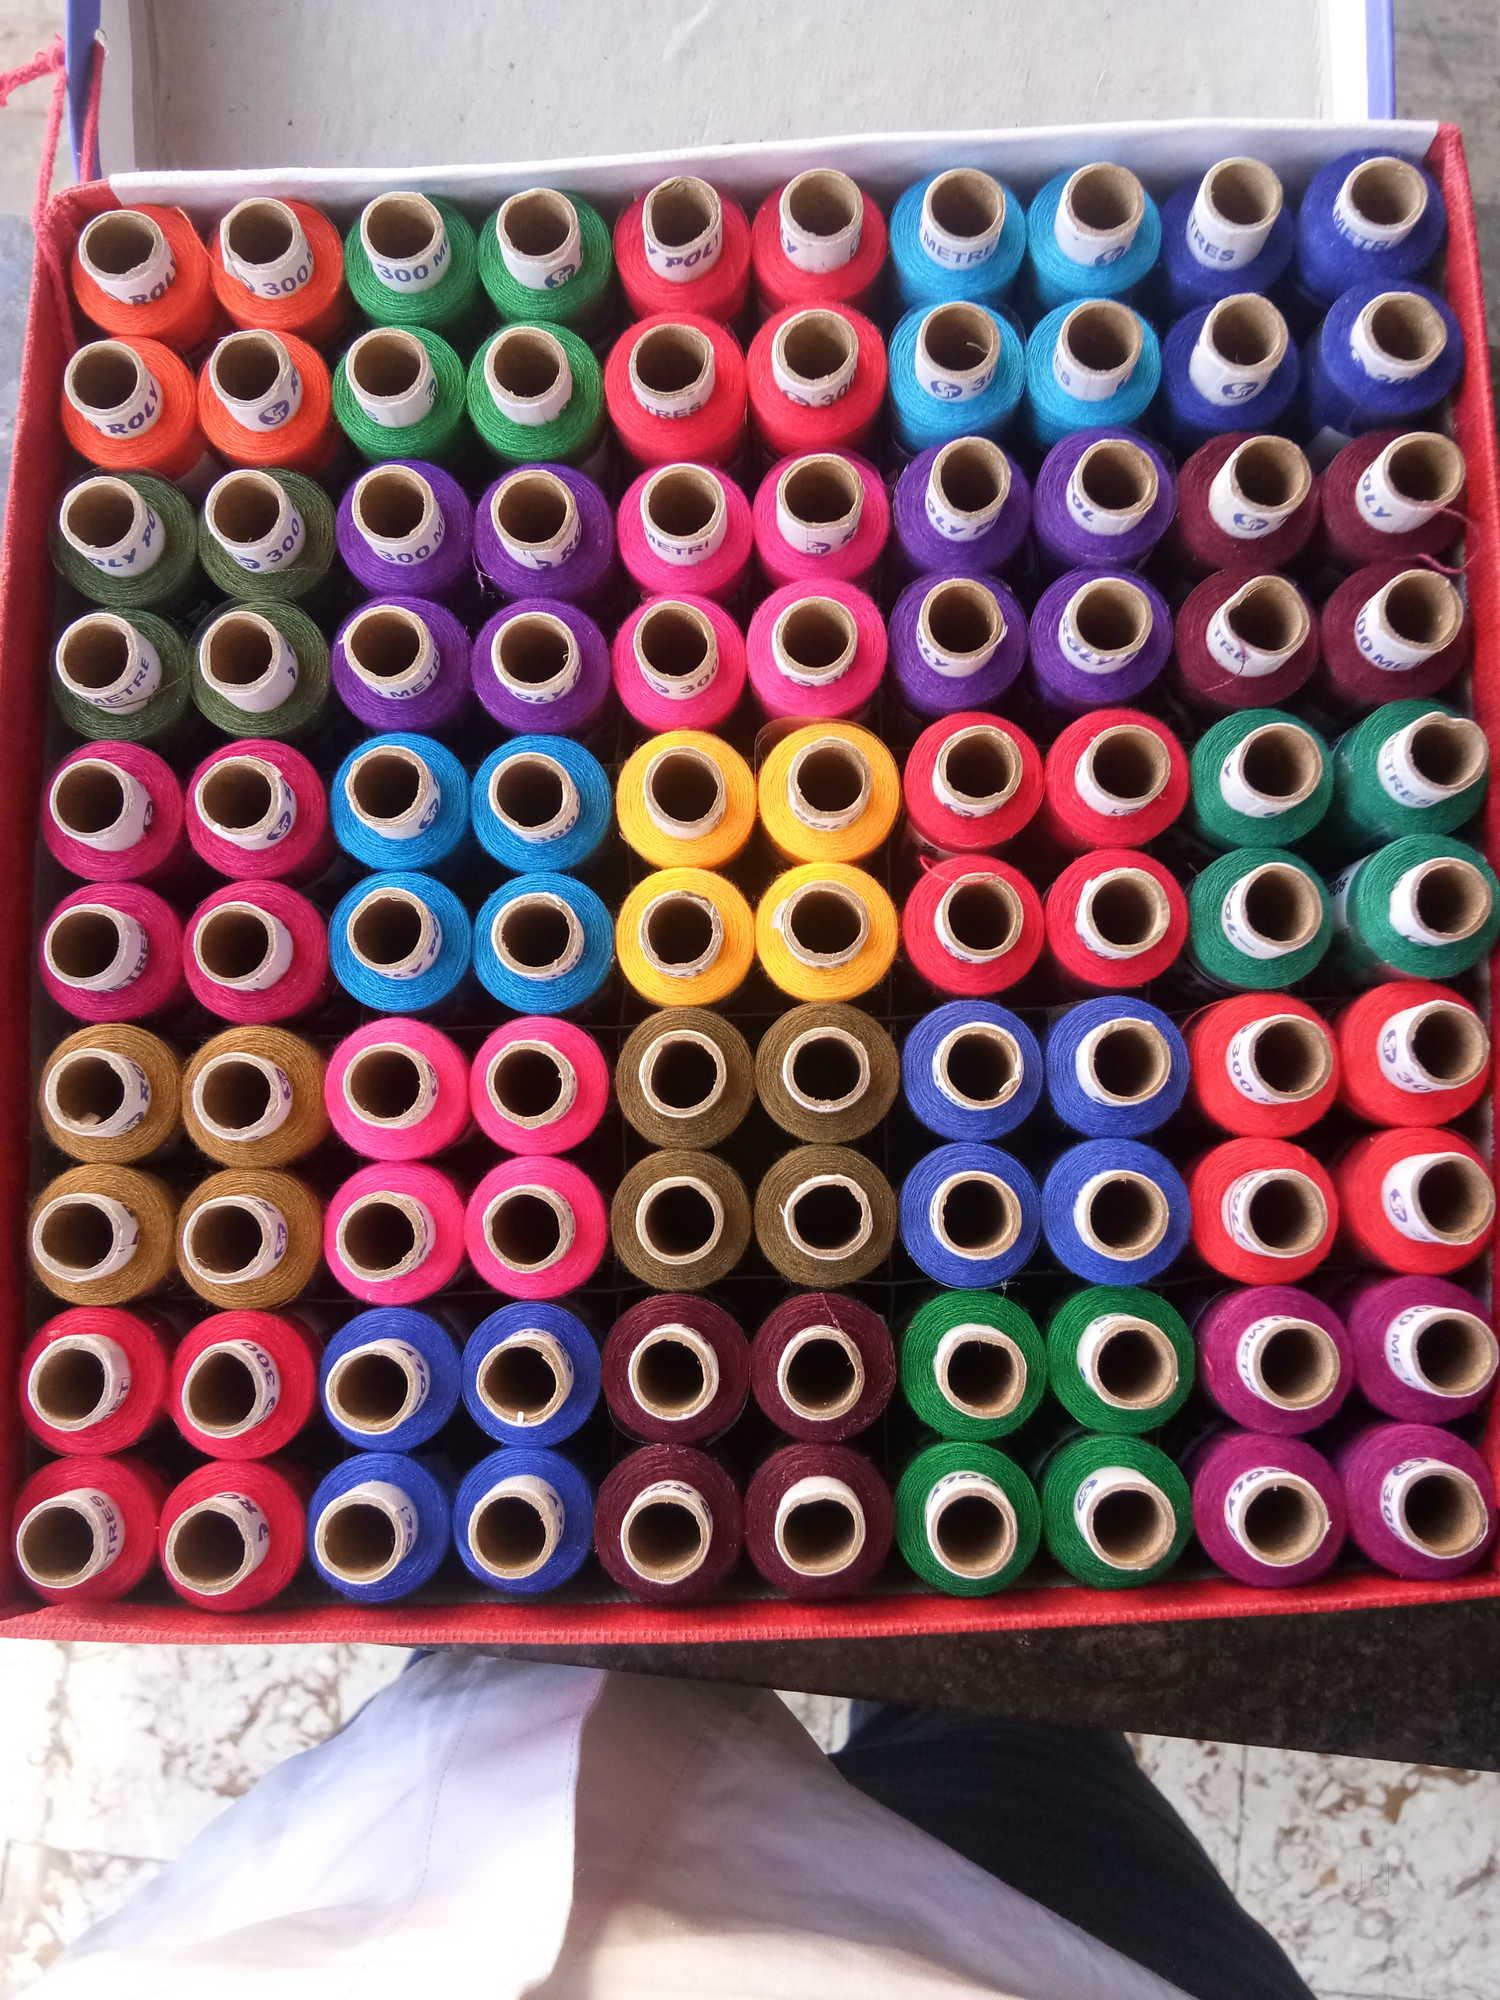 Top 30 Thread Dealers in Indore - Best Thread Suppliers